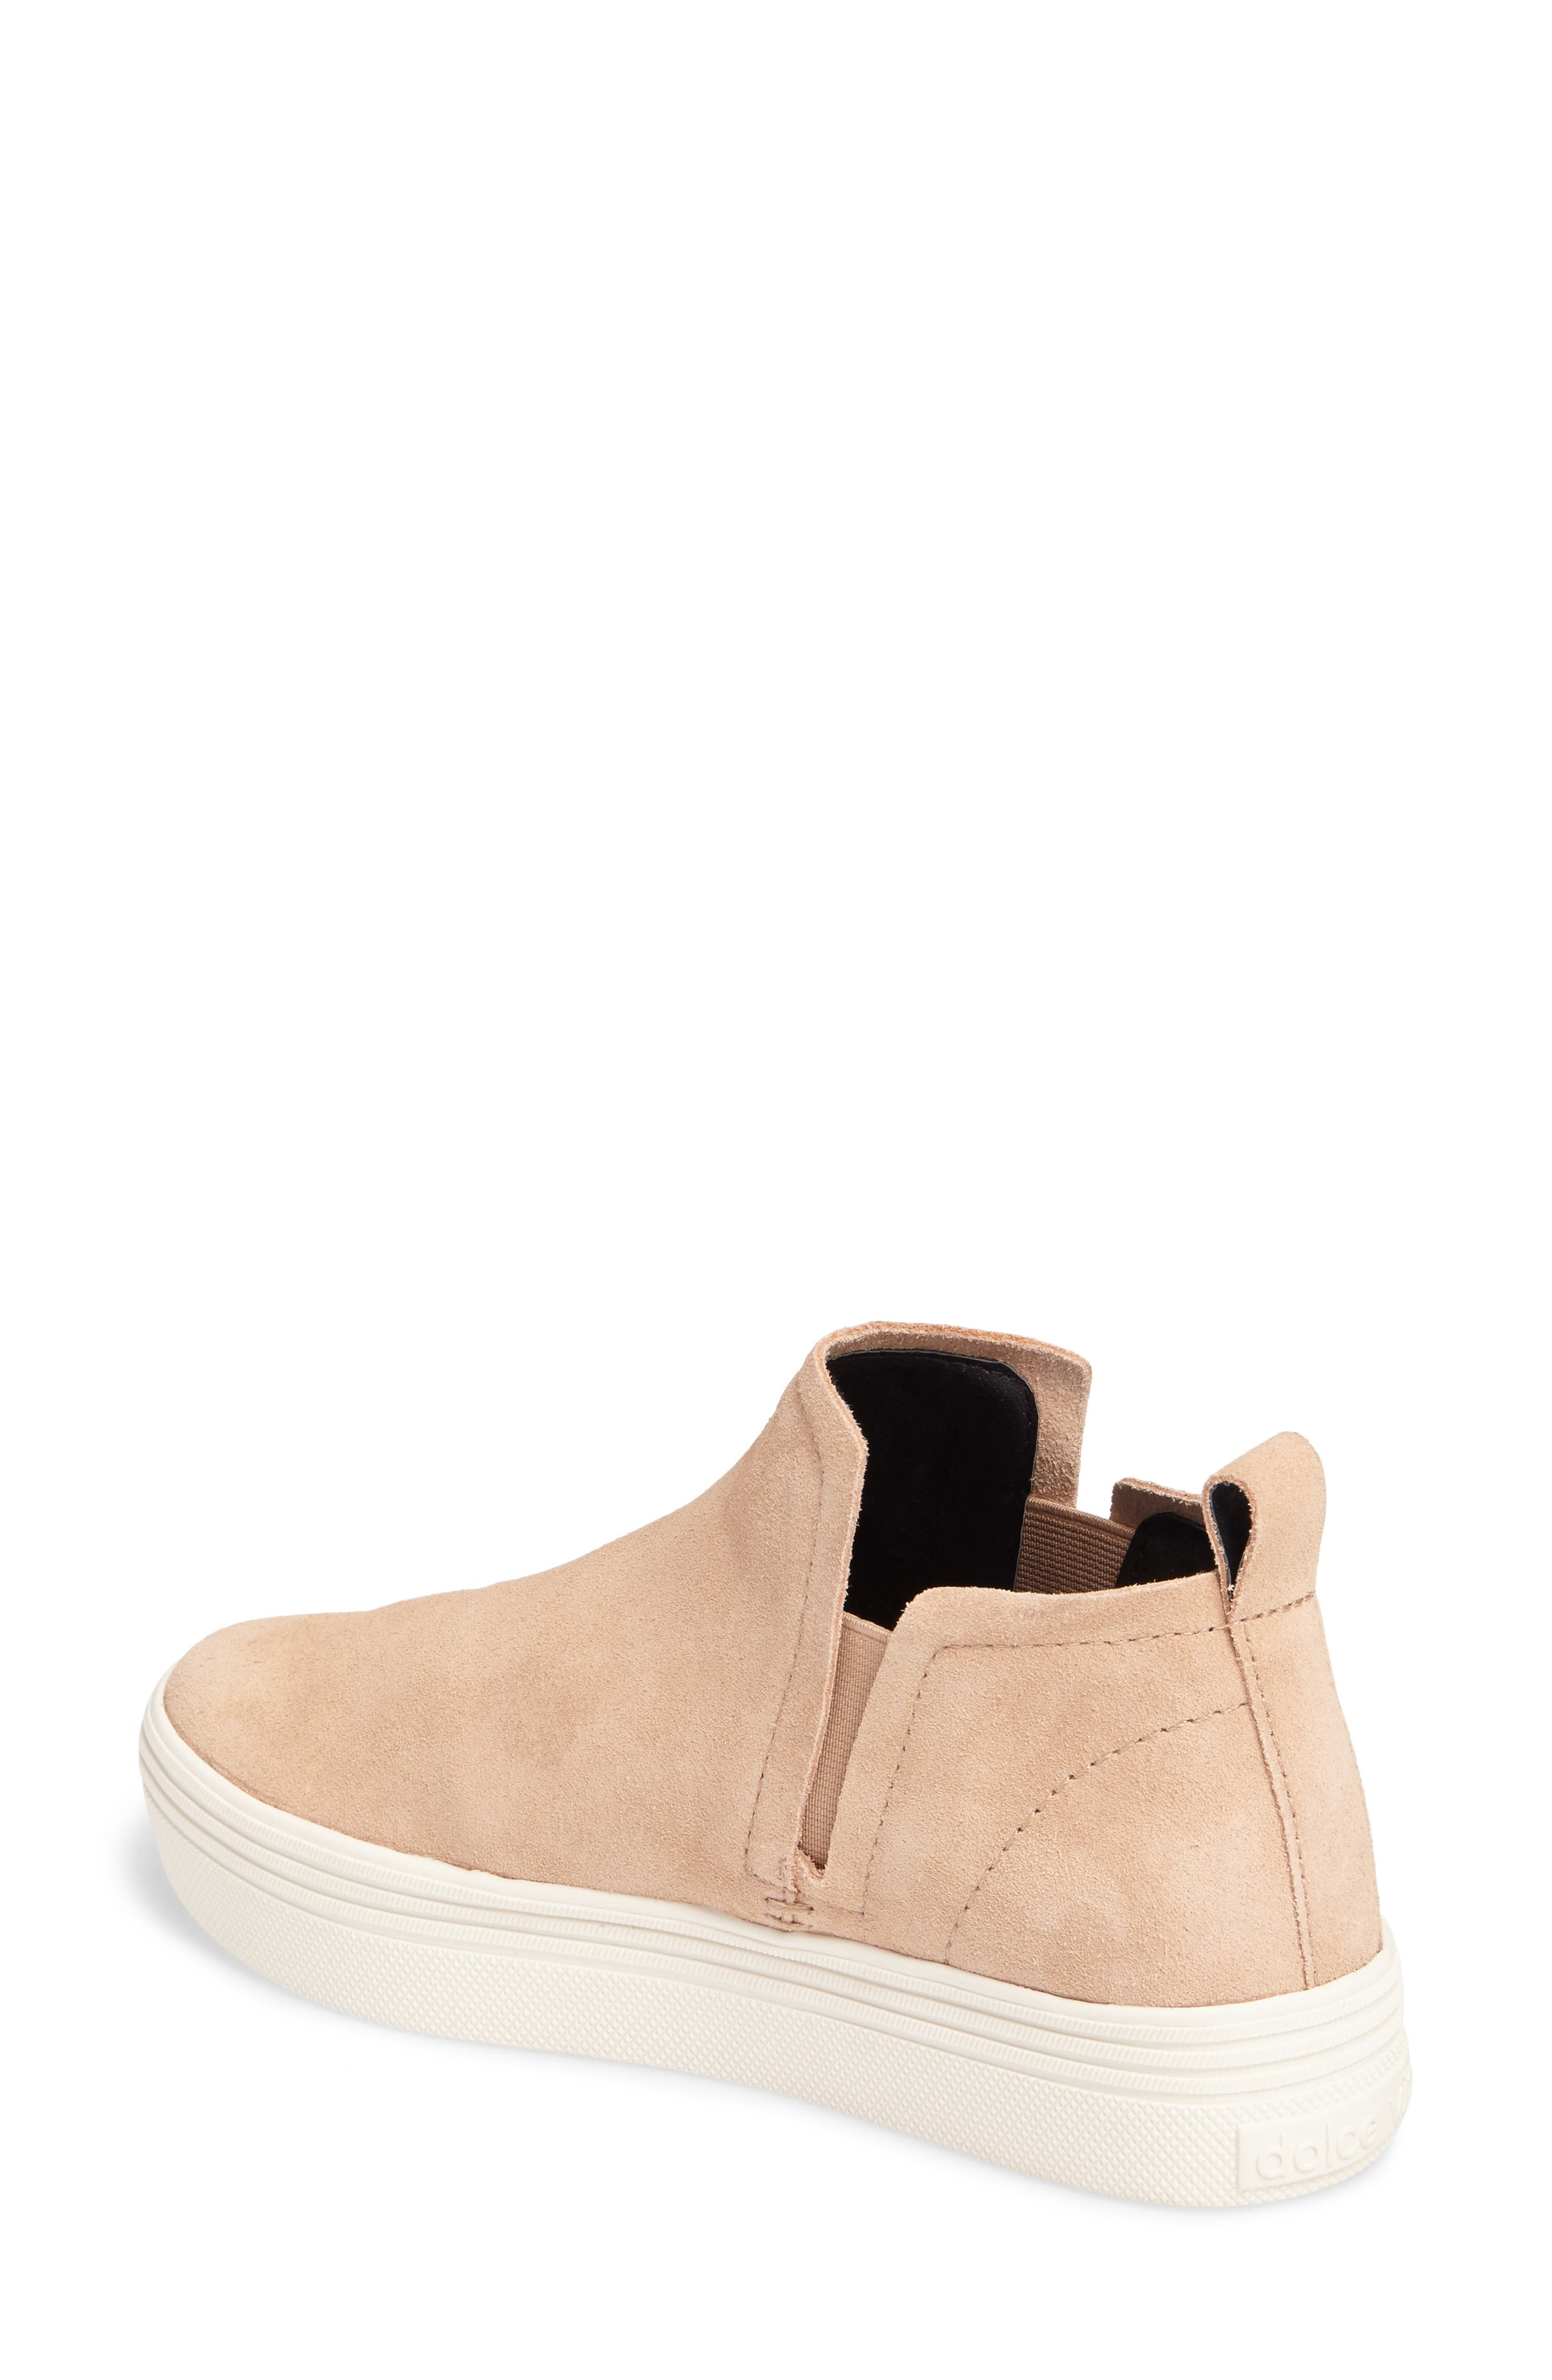 Tate Slip-On Sneaker,                             Alternate thumbnail 2, color,                             Blush Suede